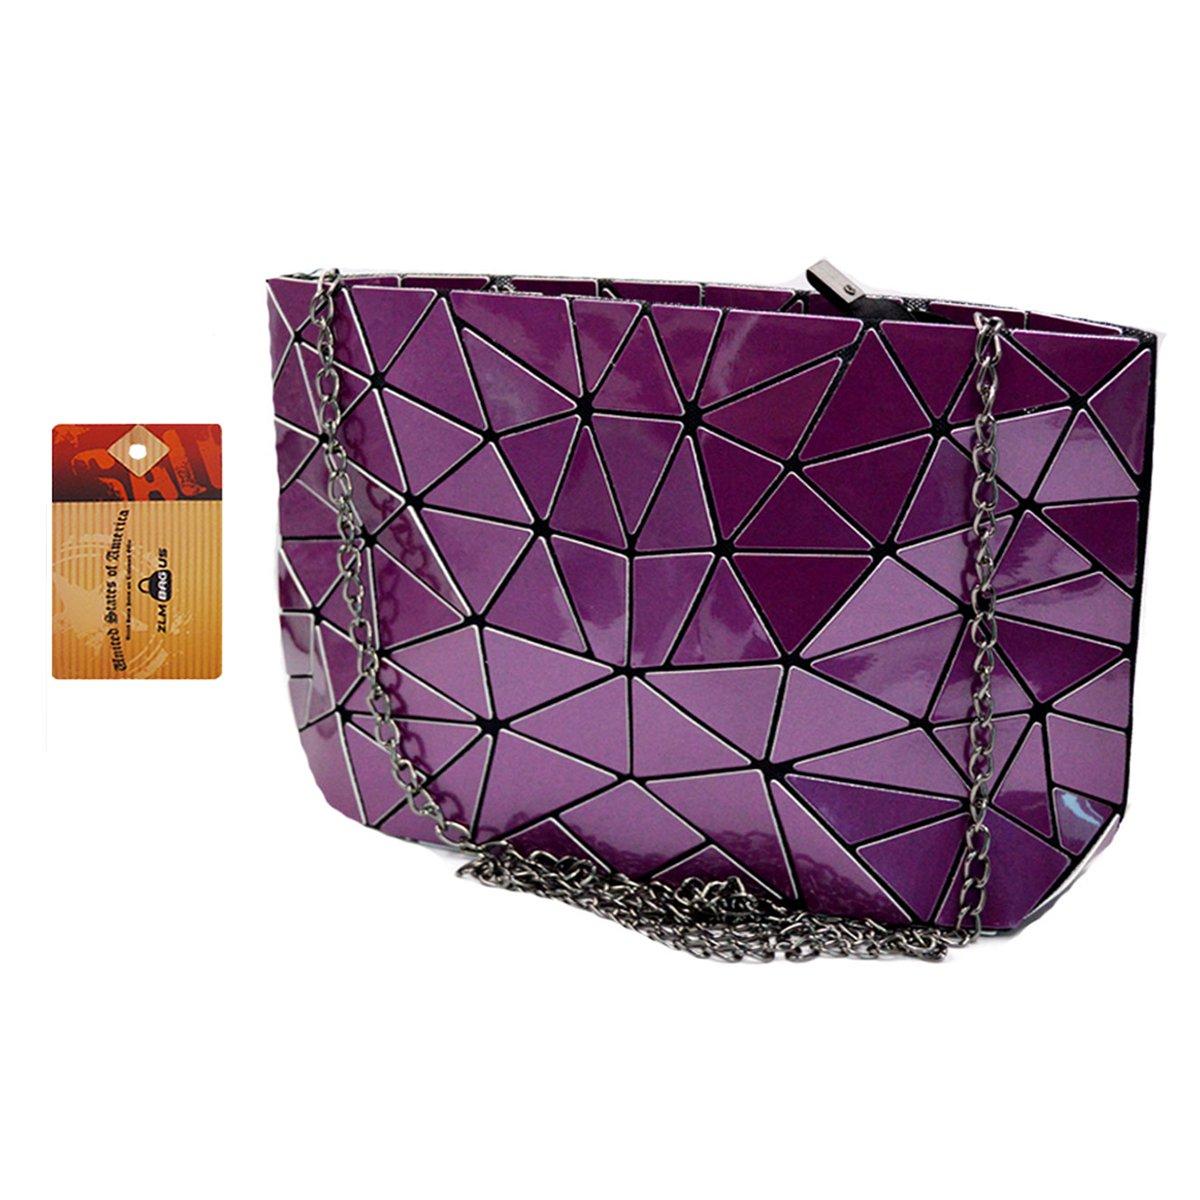 ZLMBAGUS Fashion Hologram Laser Envelope Clutch Geometric Pattern PU Tote Handbag Metal Chain Shoulder Crossbody Bag Purple